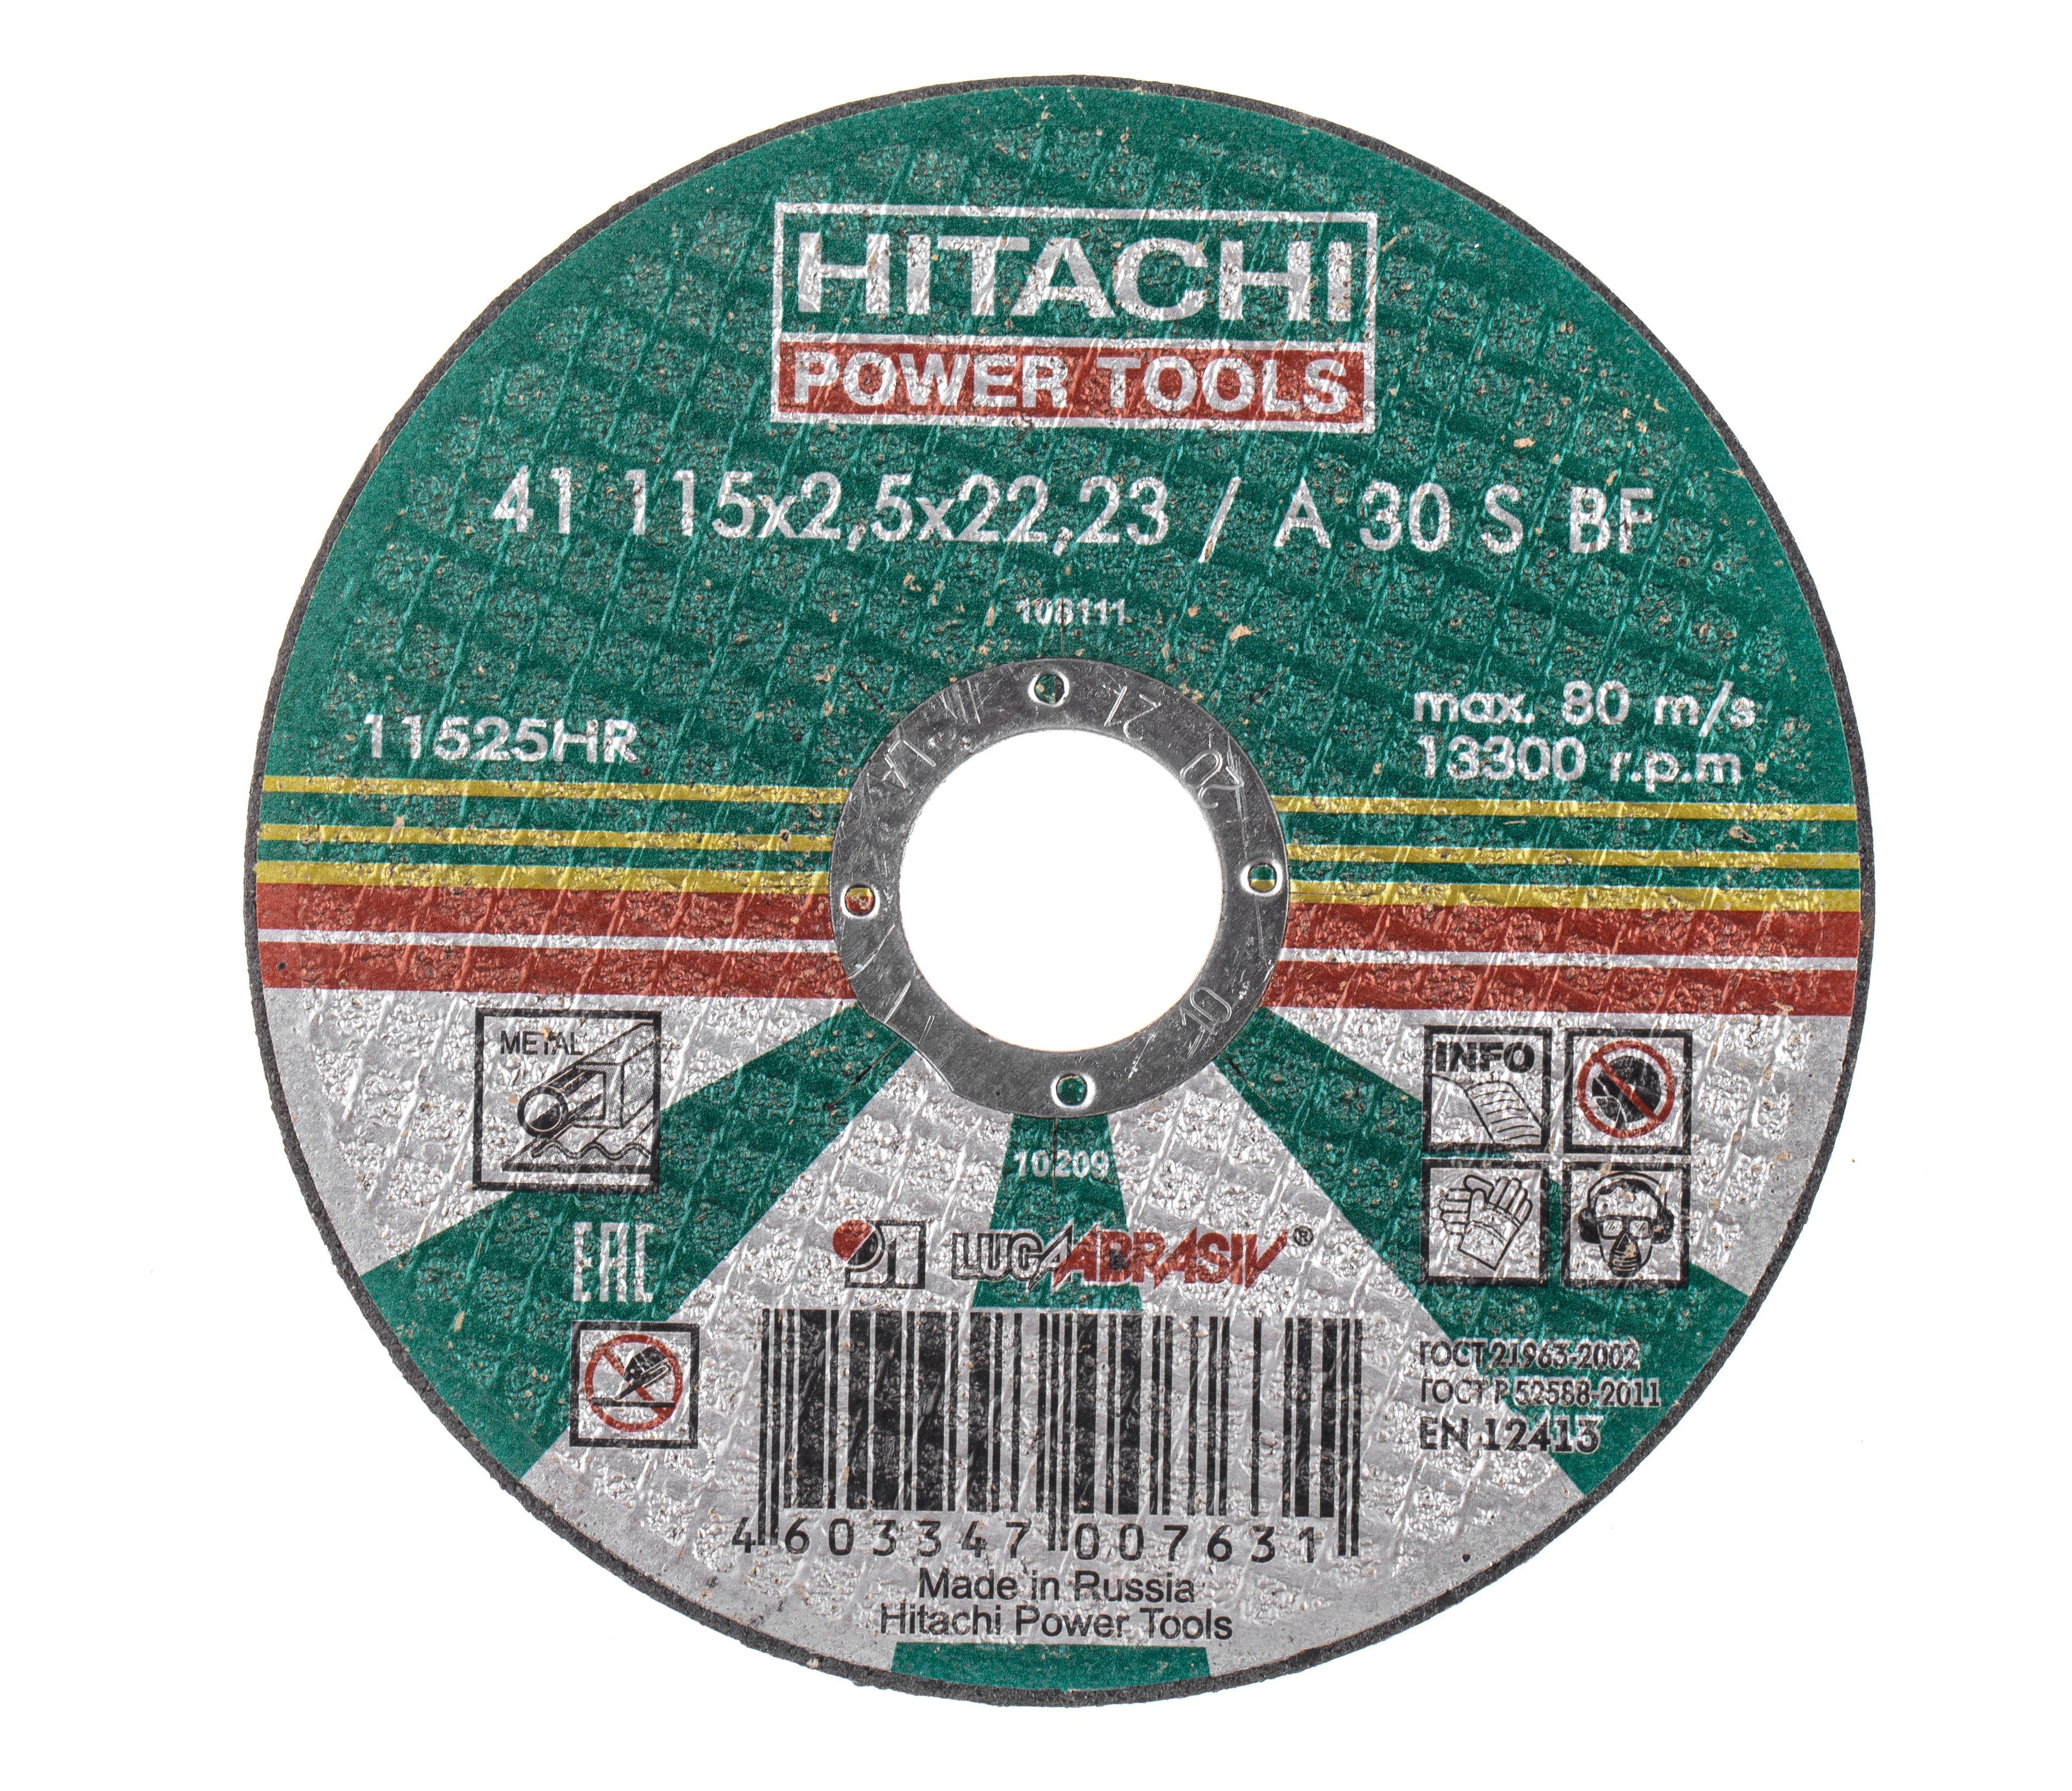 Круг отрезной Hitachi А24 115 Х 2,5 Х 22 по металлу 25шт круг отрезной hitachi а24 115 х 1 2 х 22 по металлу 50шт